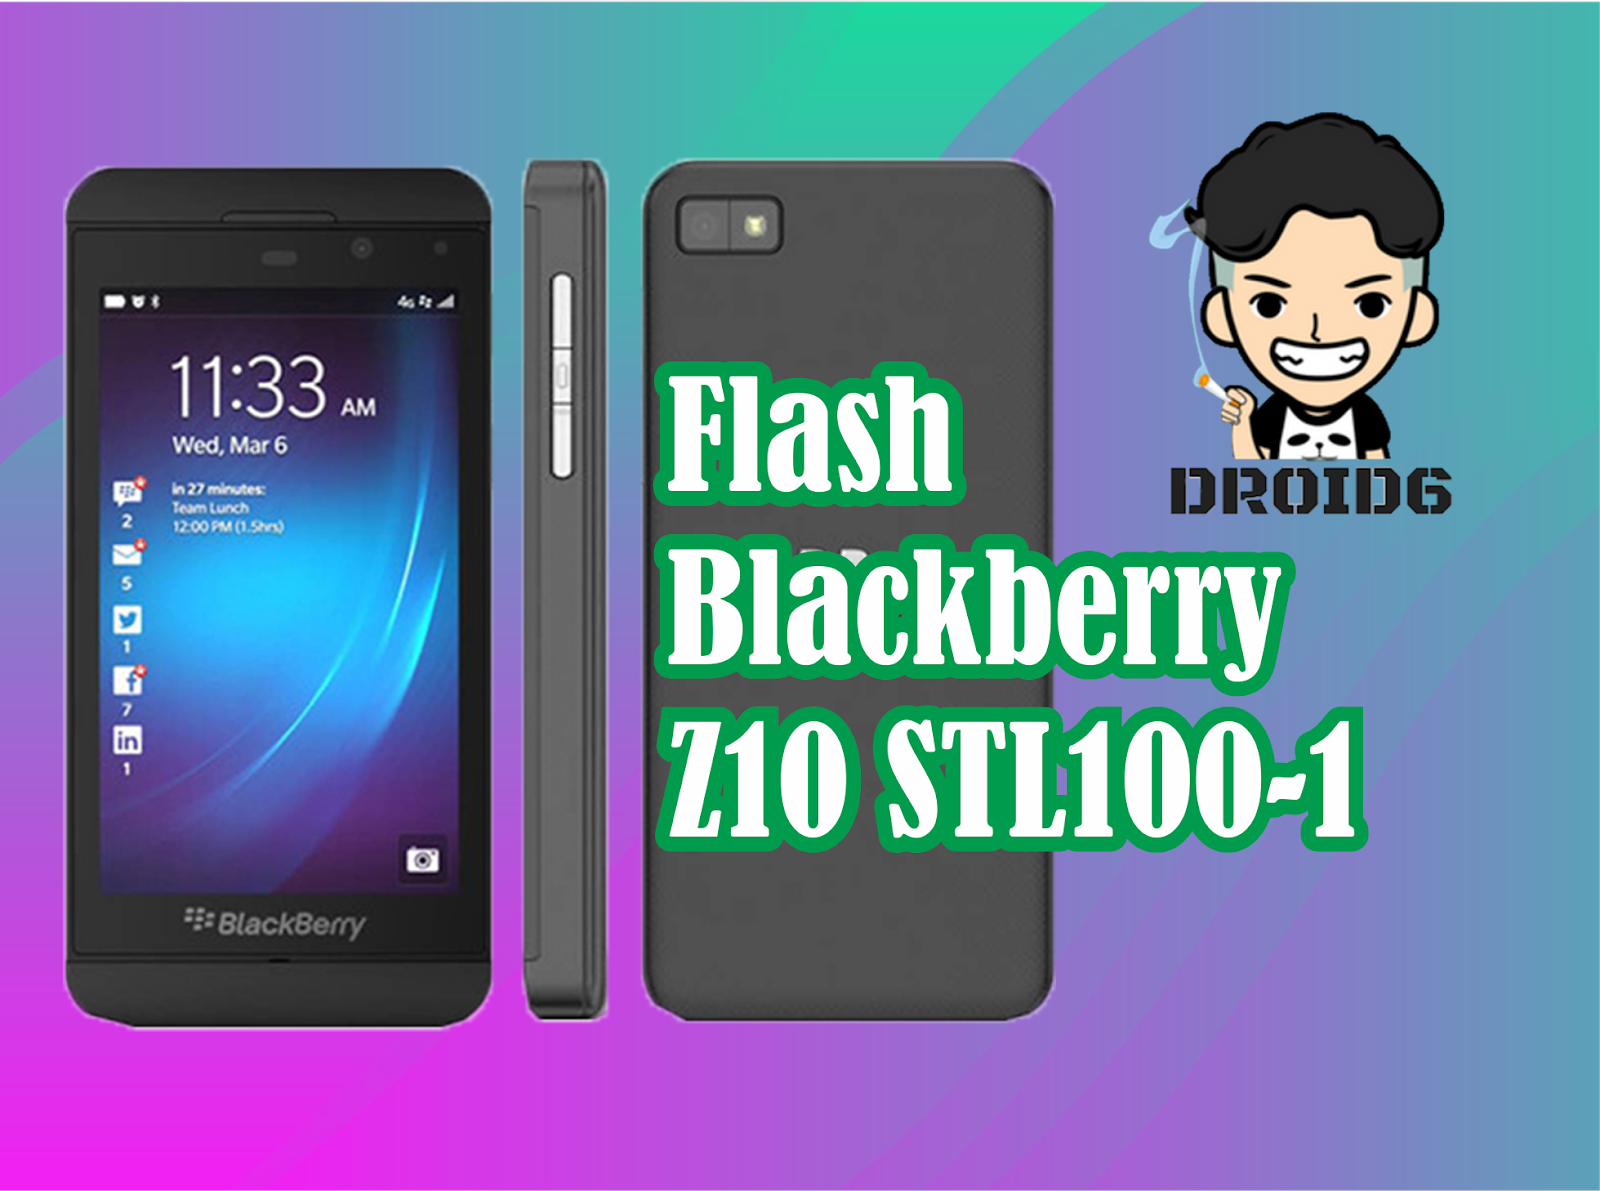 Cara Flash Blackberry Z10 STL100-1 - DROID6   Tutorial Flash